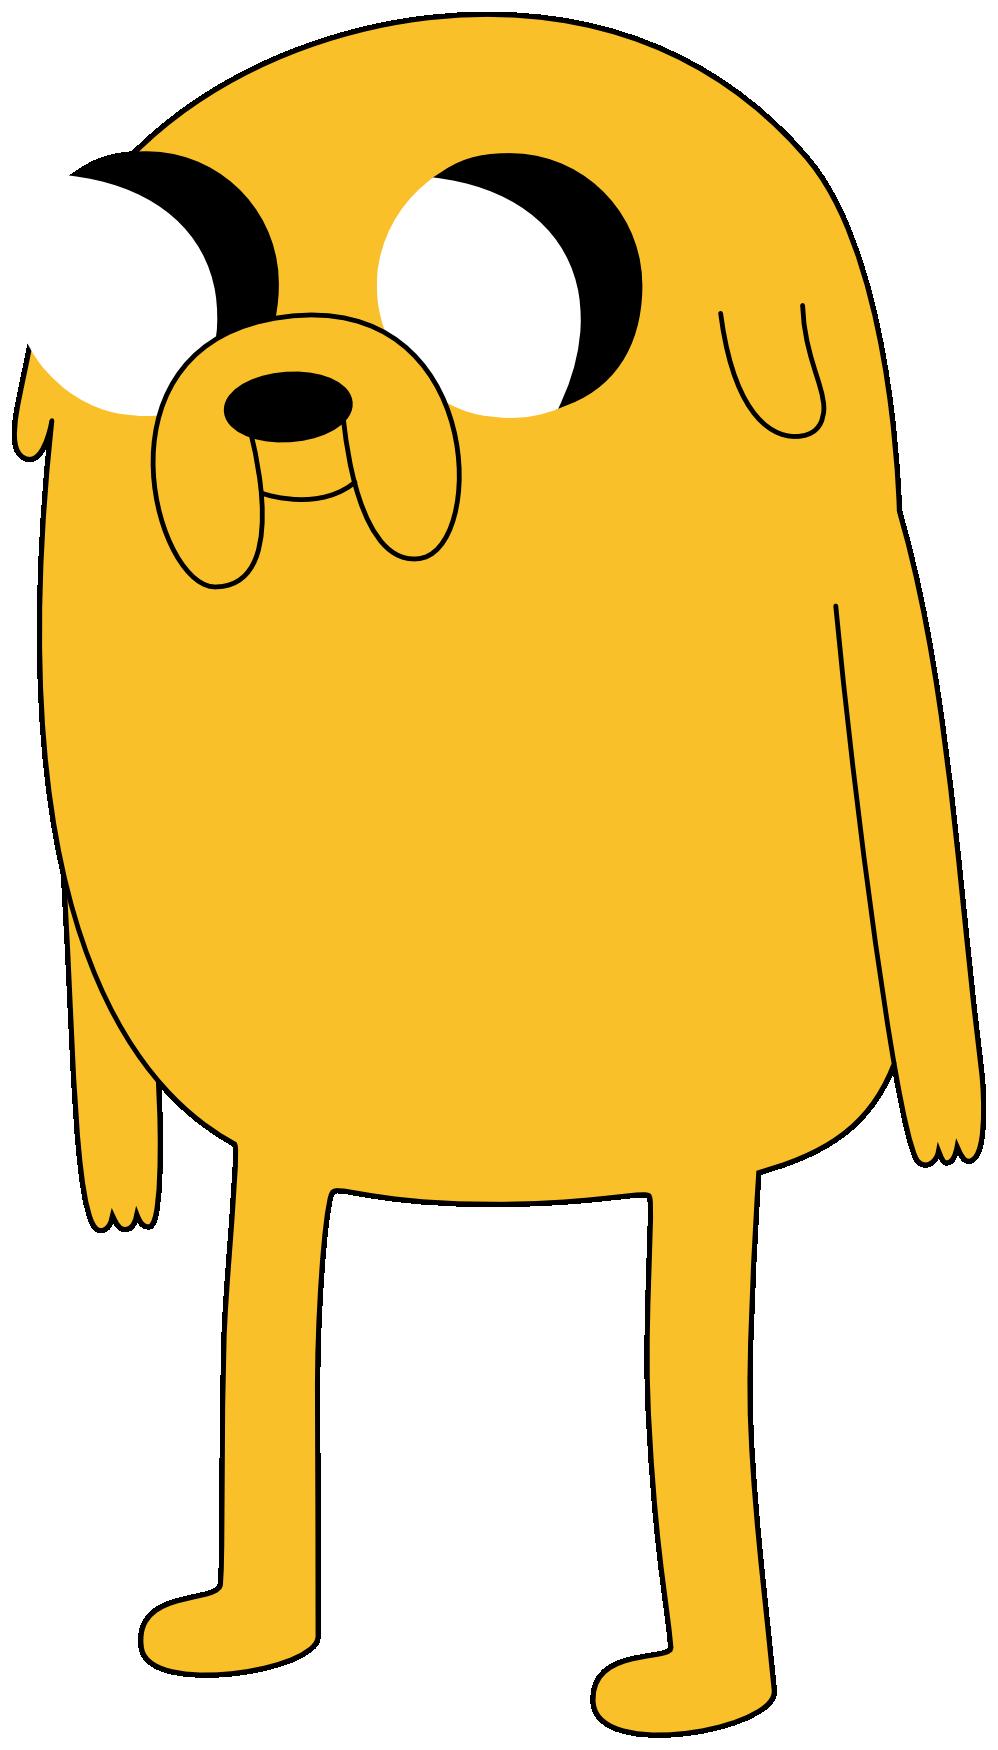 Jake the Dog by Hankovich on deviantART: hankovich.deviantart.com/art/jake-the-dog-385323289